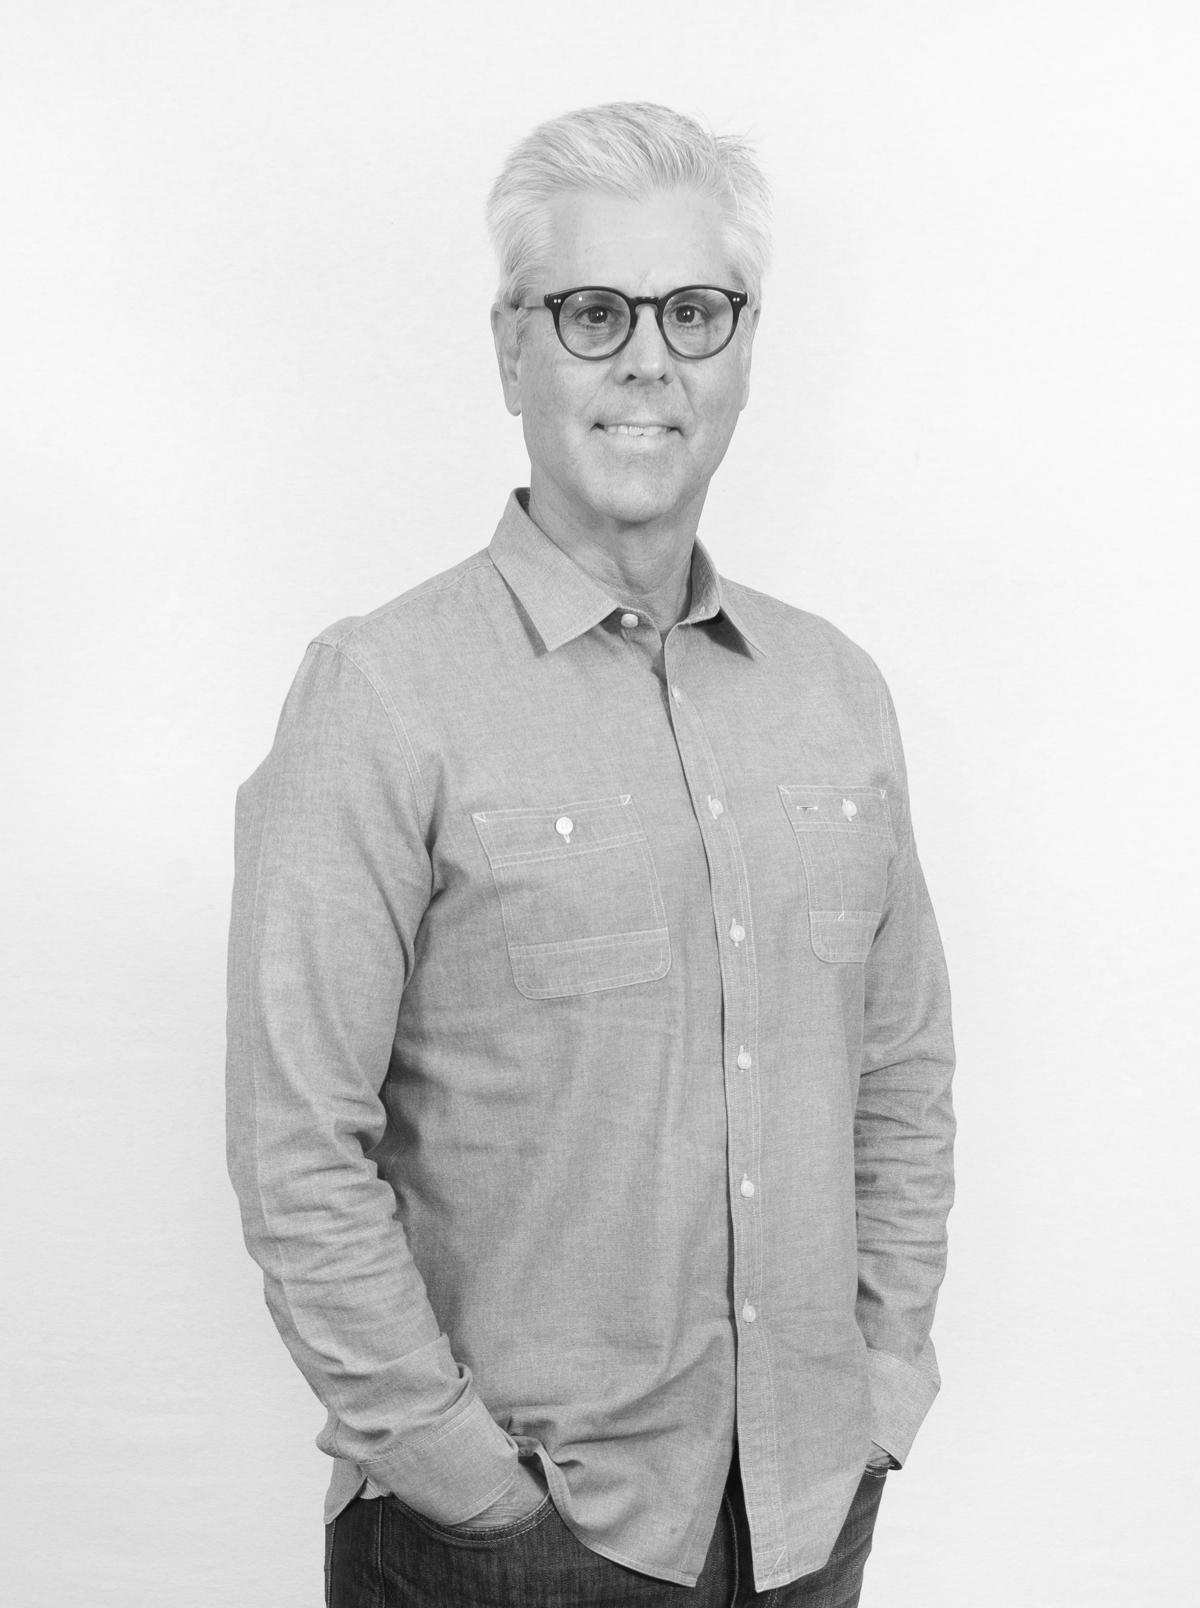 Greg Yerkes